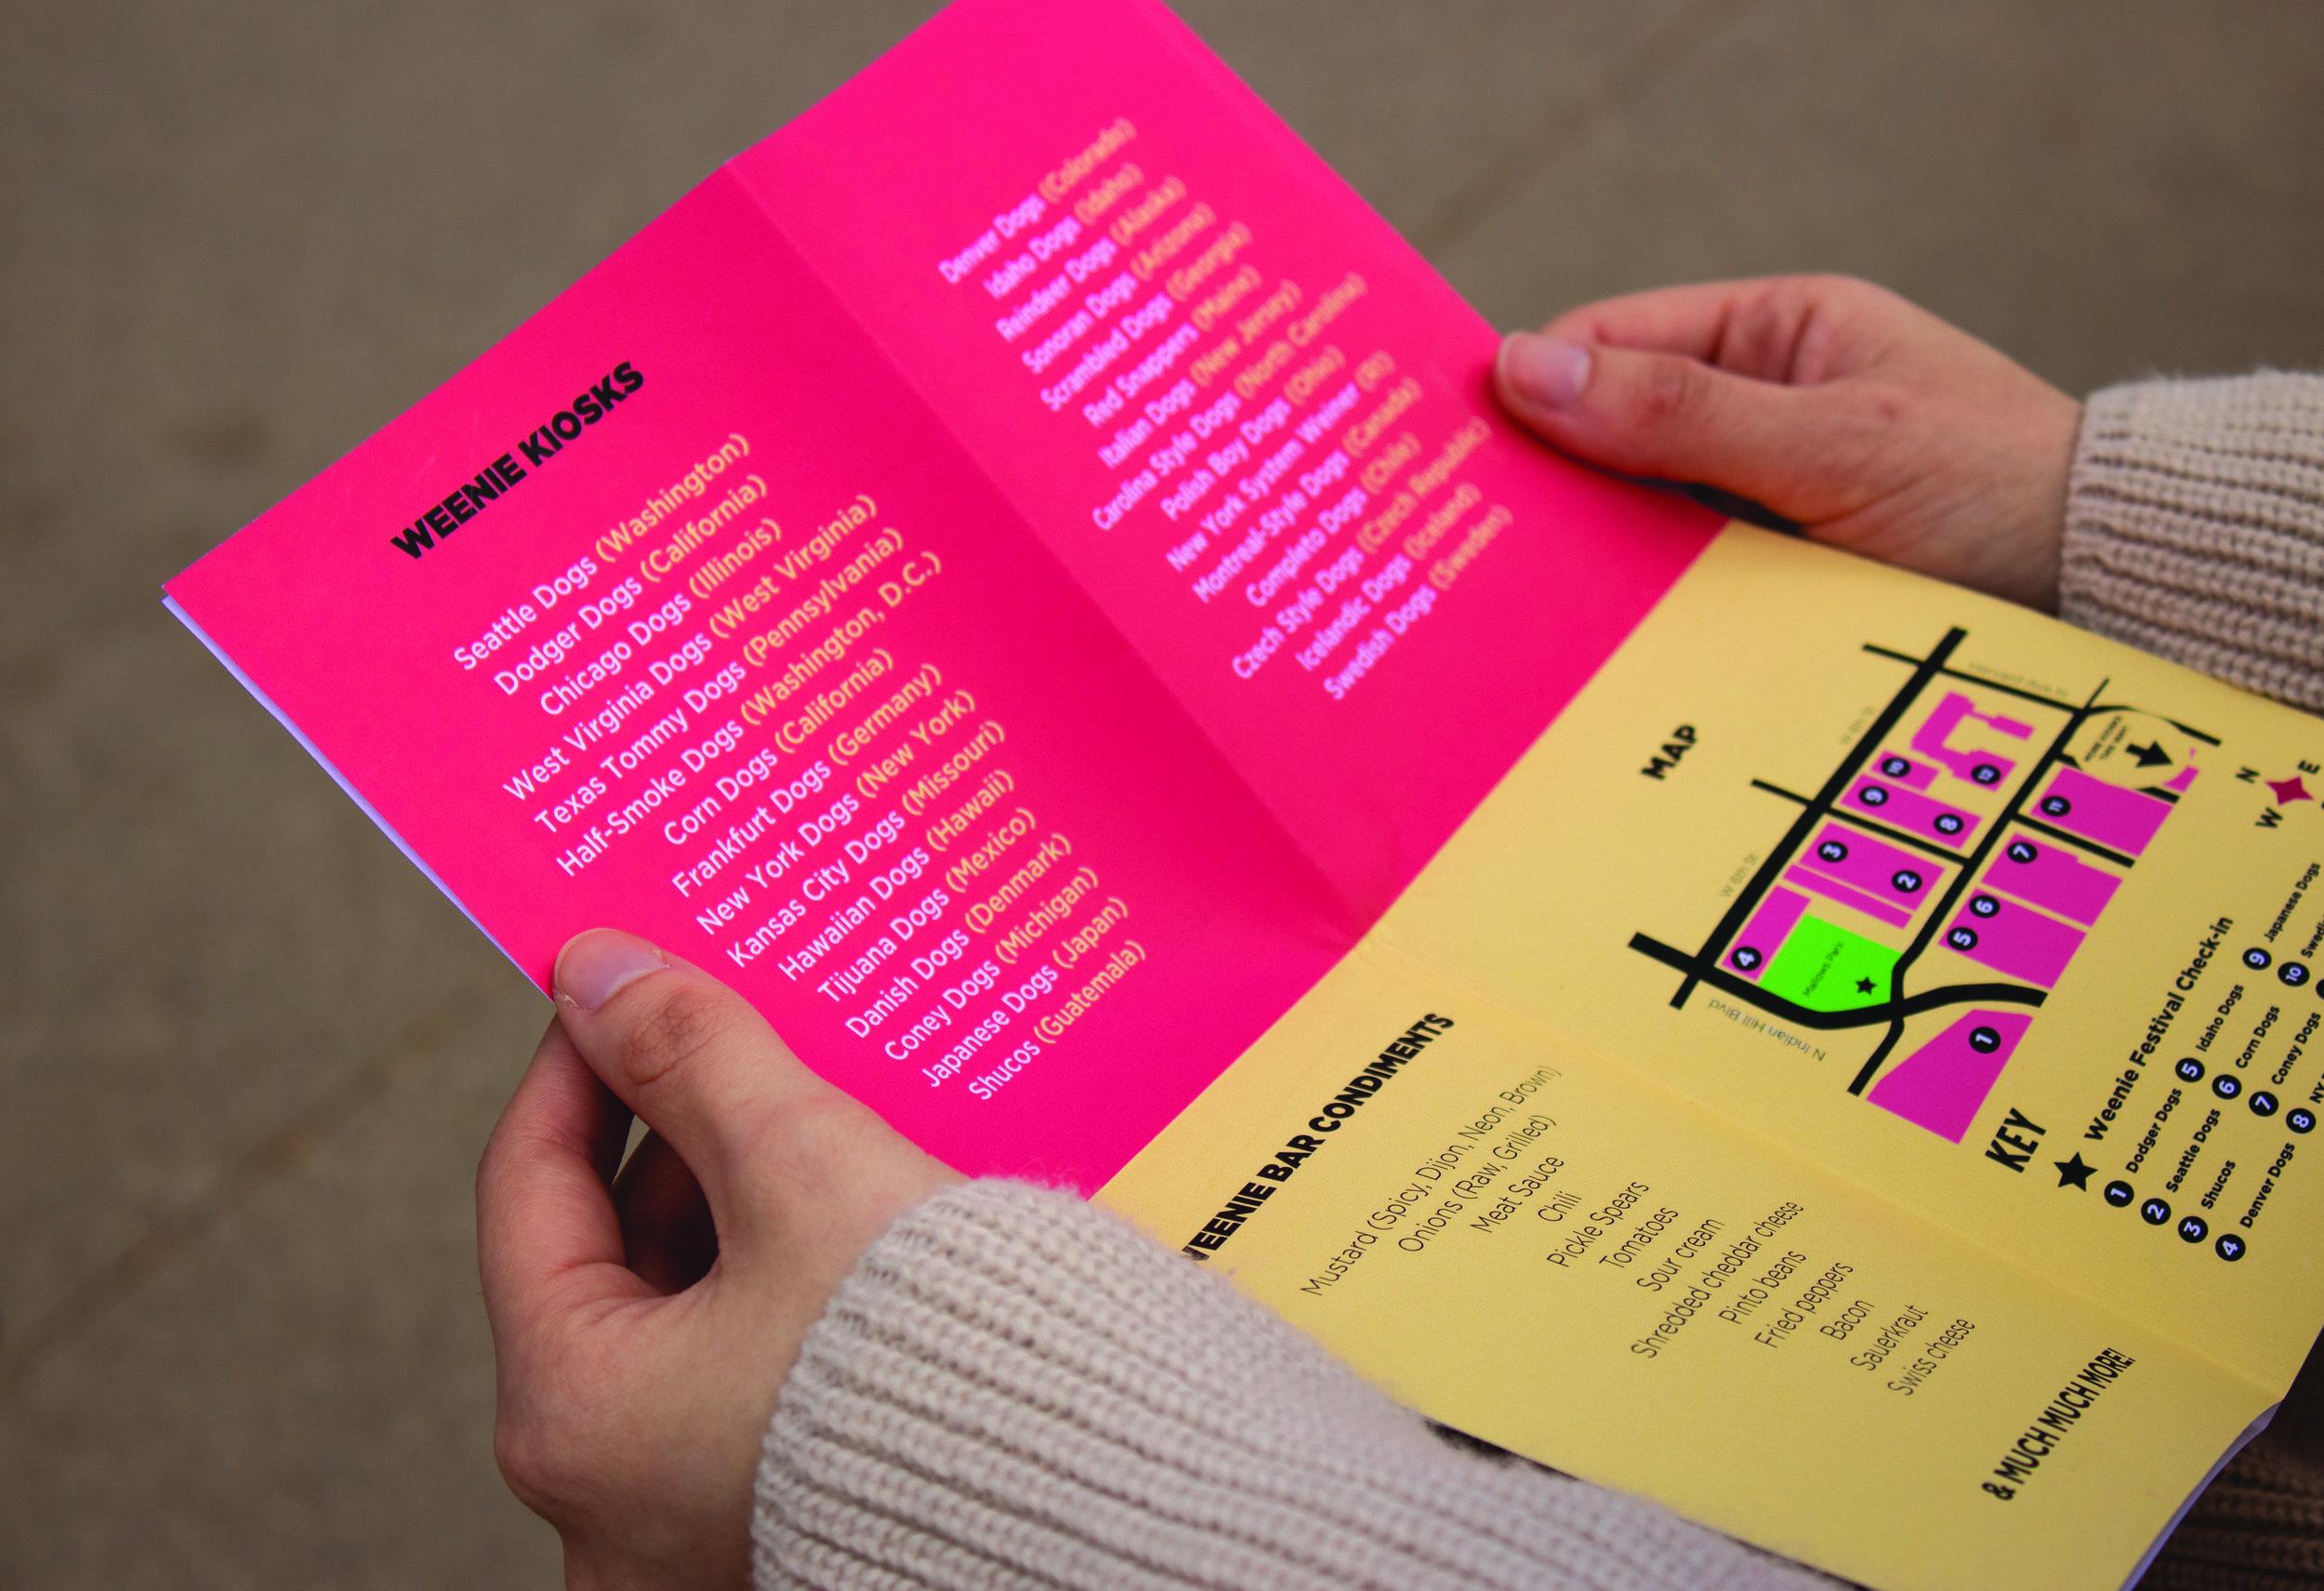 BrochureMockup.jpg